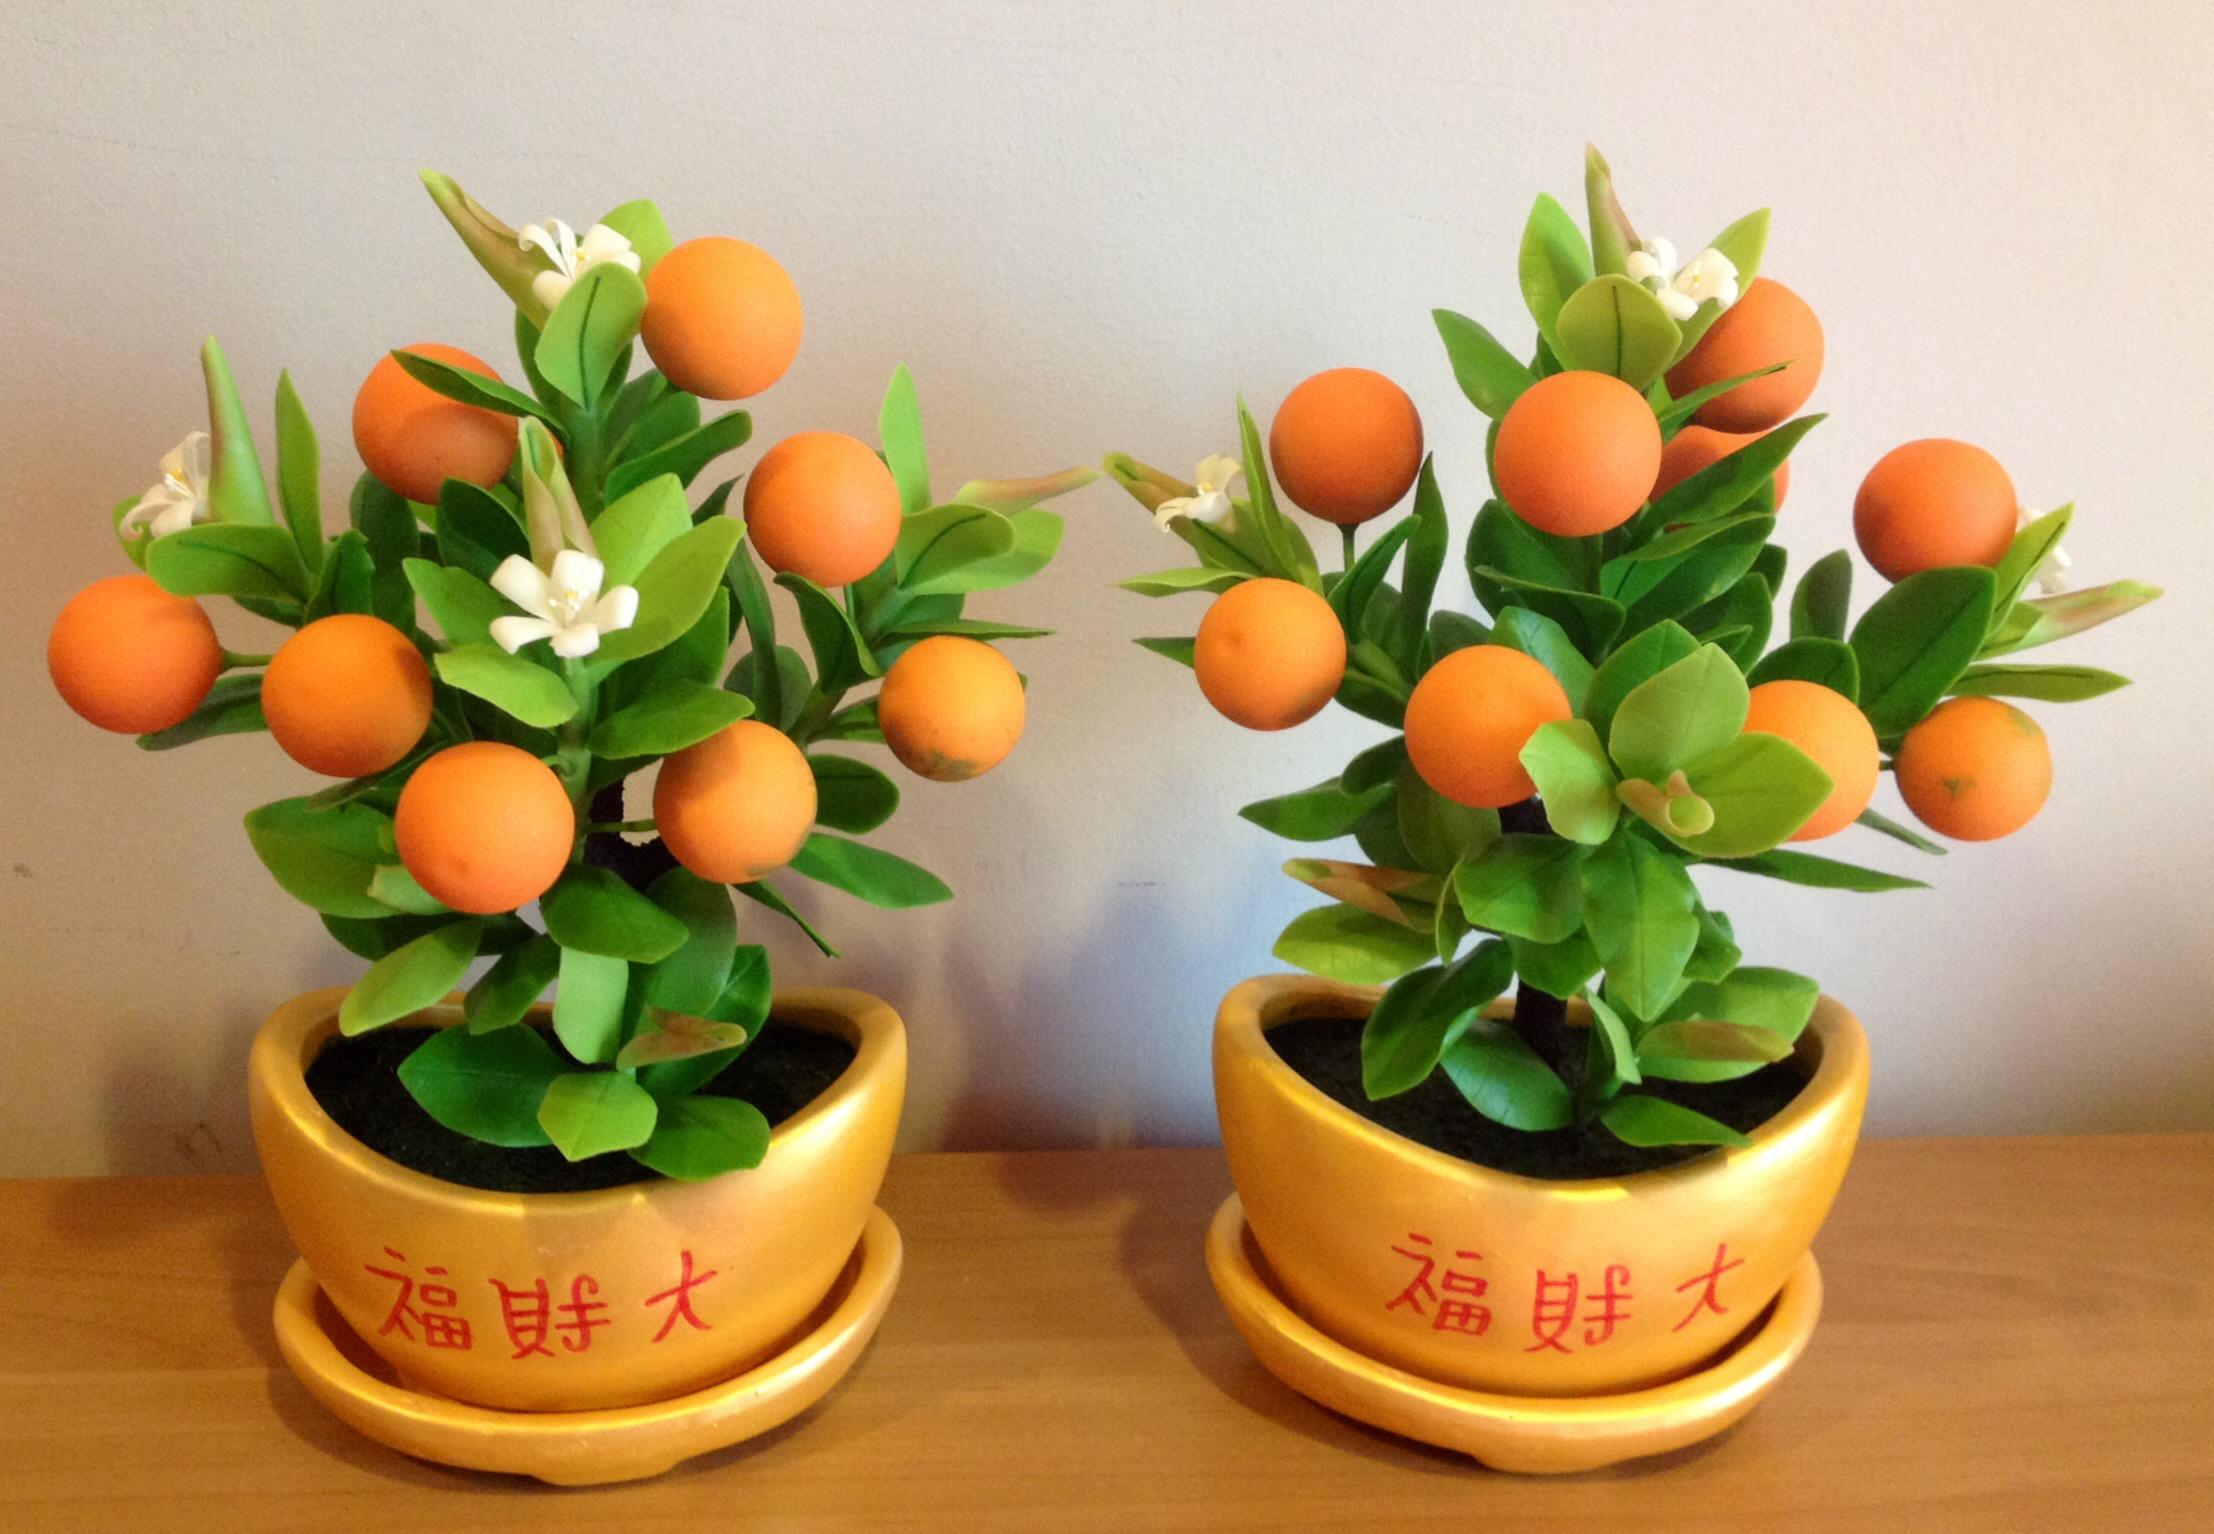 S004-ต้นส้มสูง 9 นิ้ว จำนวน 9 ลูก